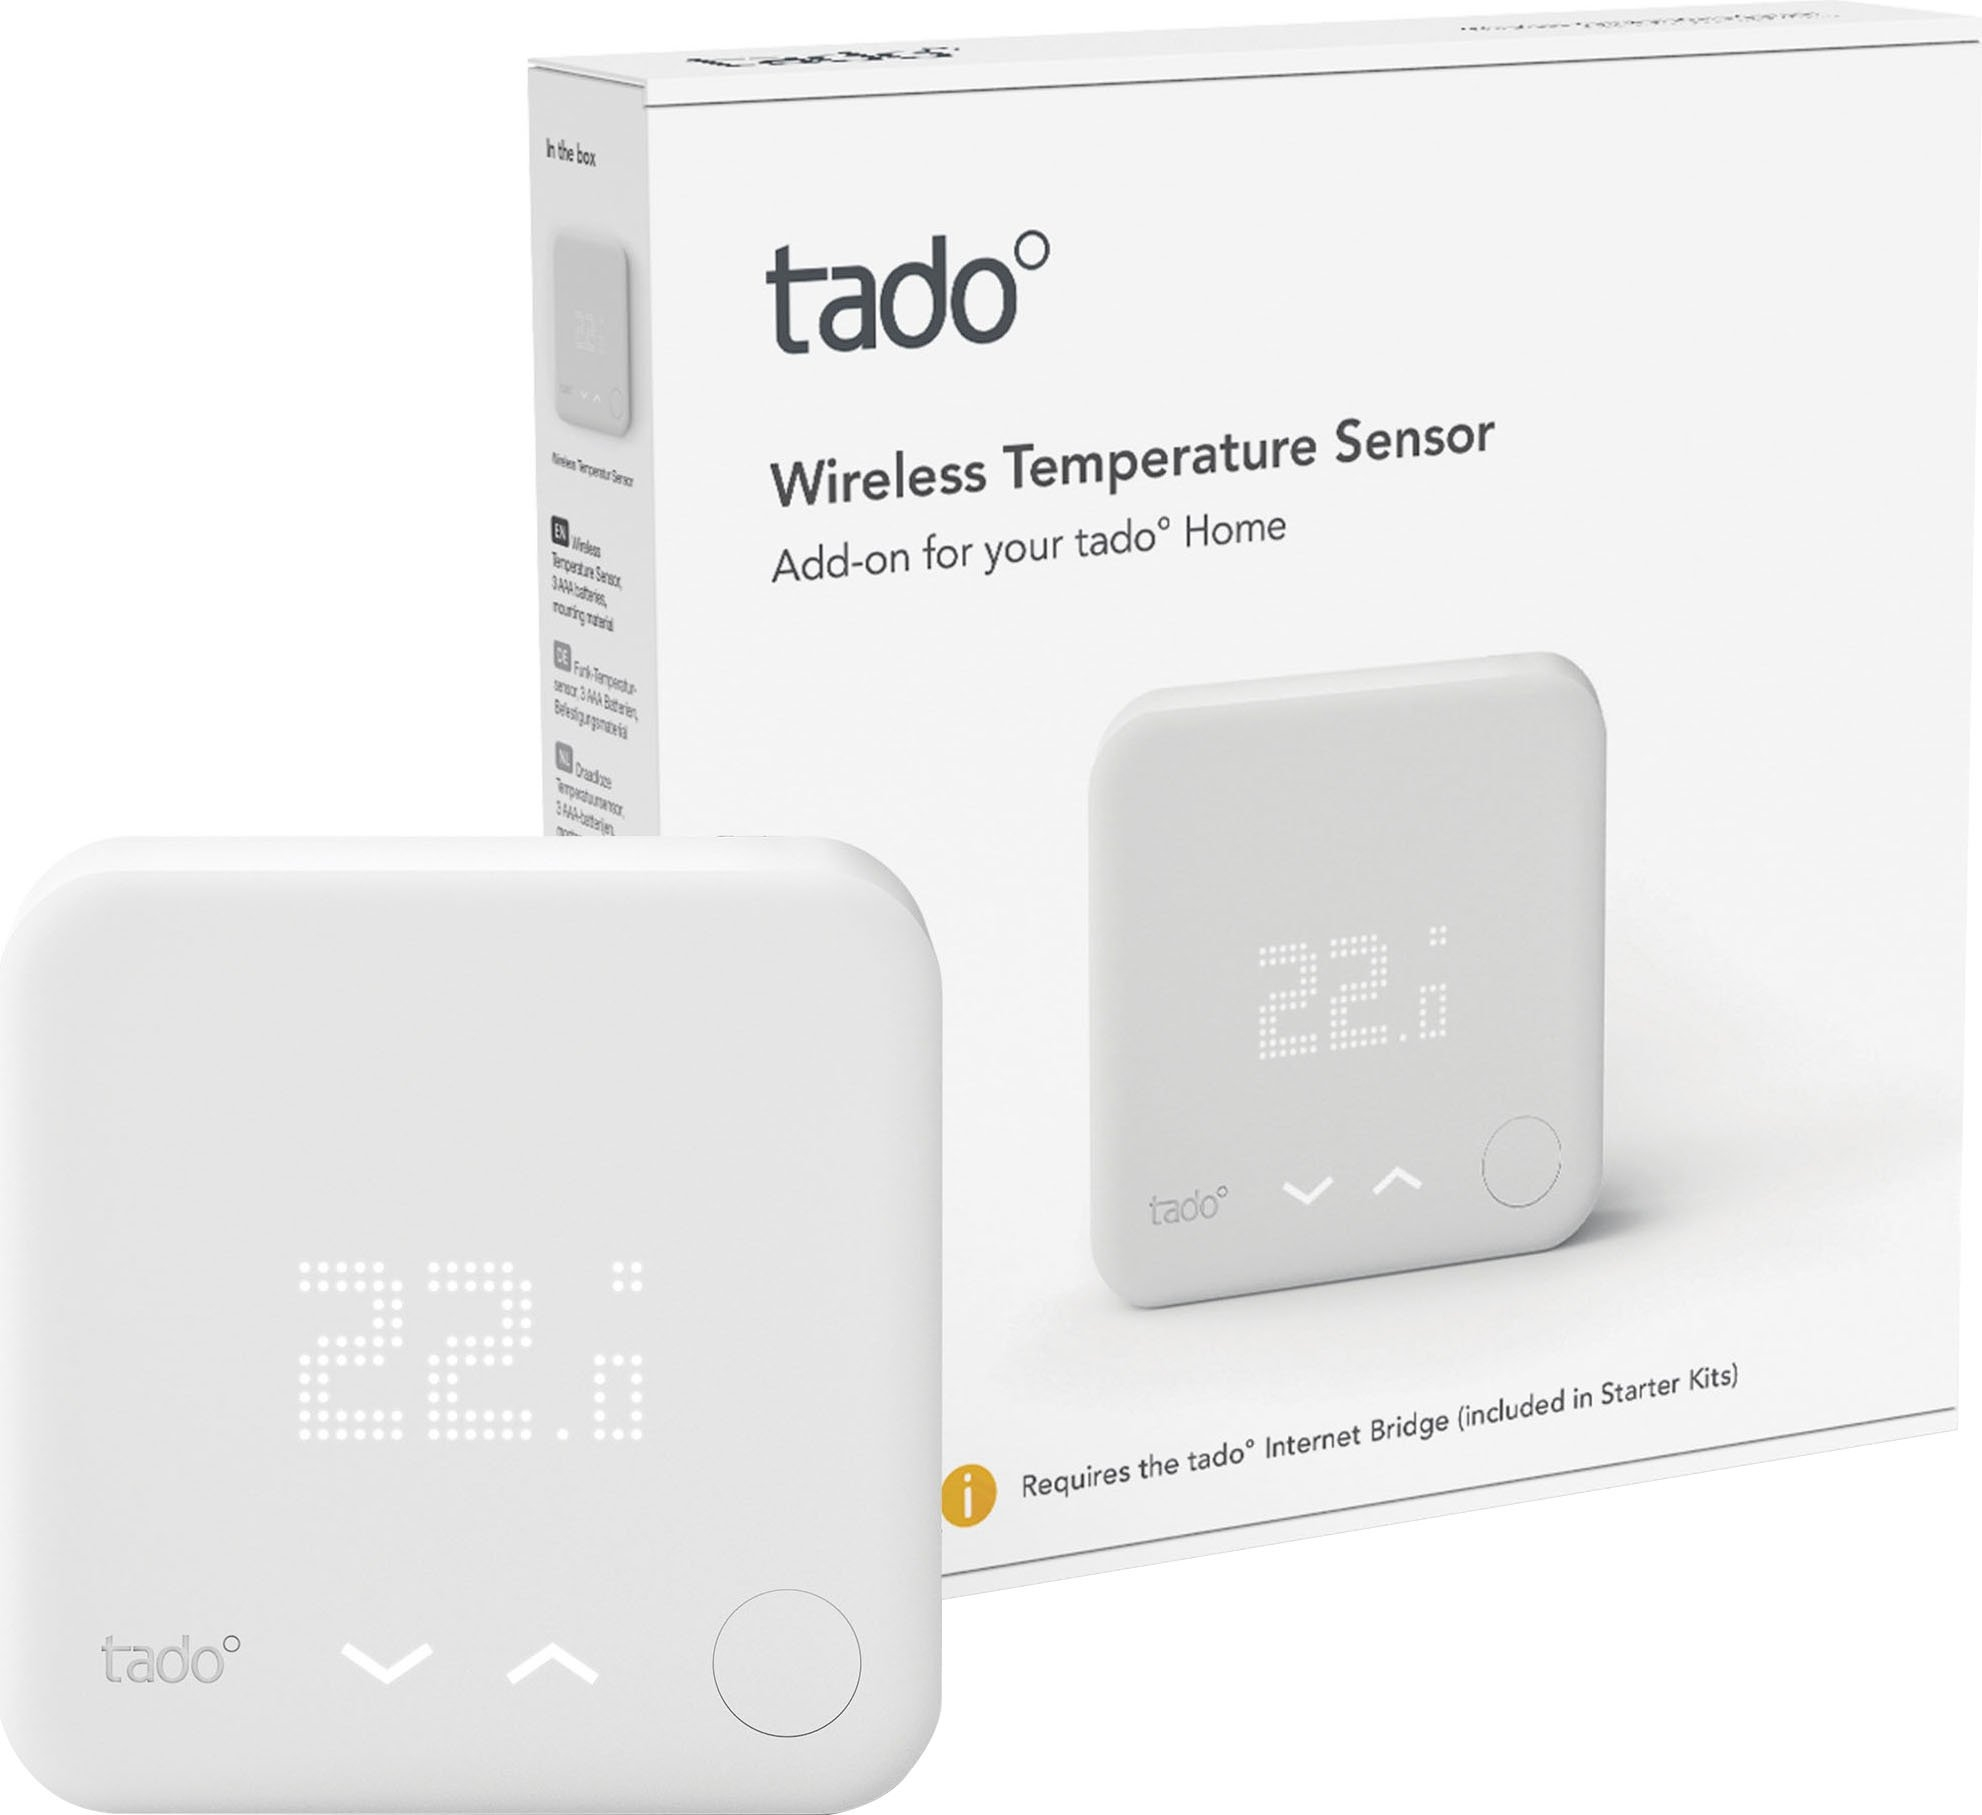 Tado smart-home-station Radiografische temperatuursensor veilig op otto.nl kopen